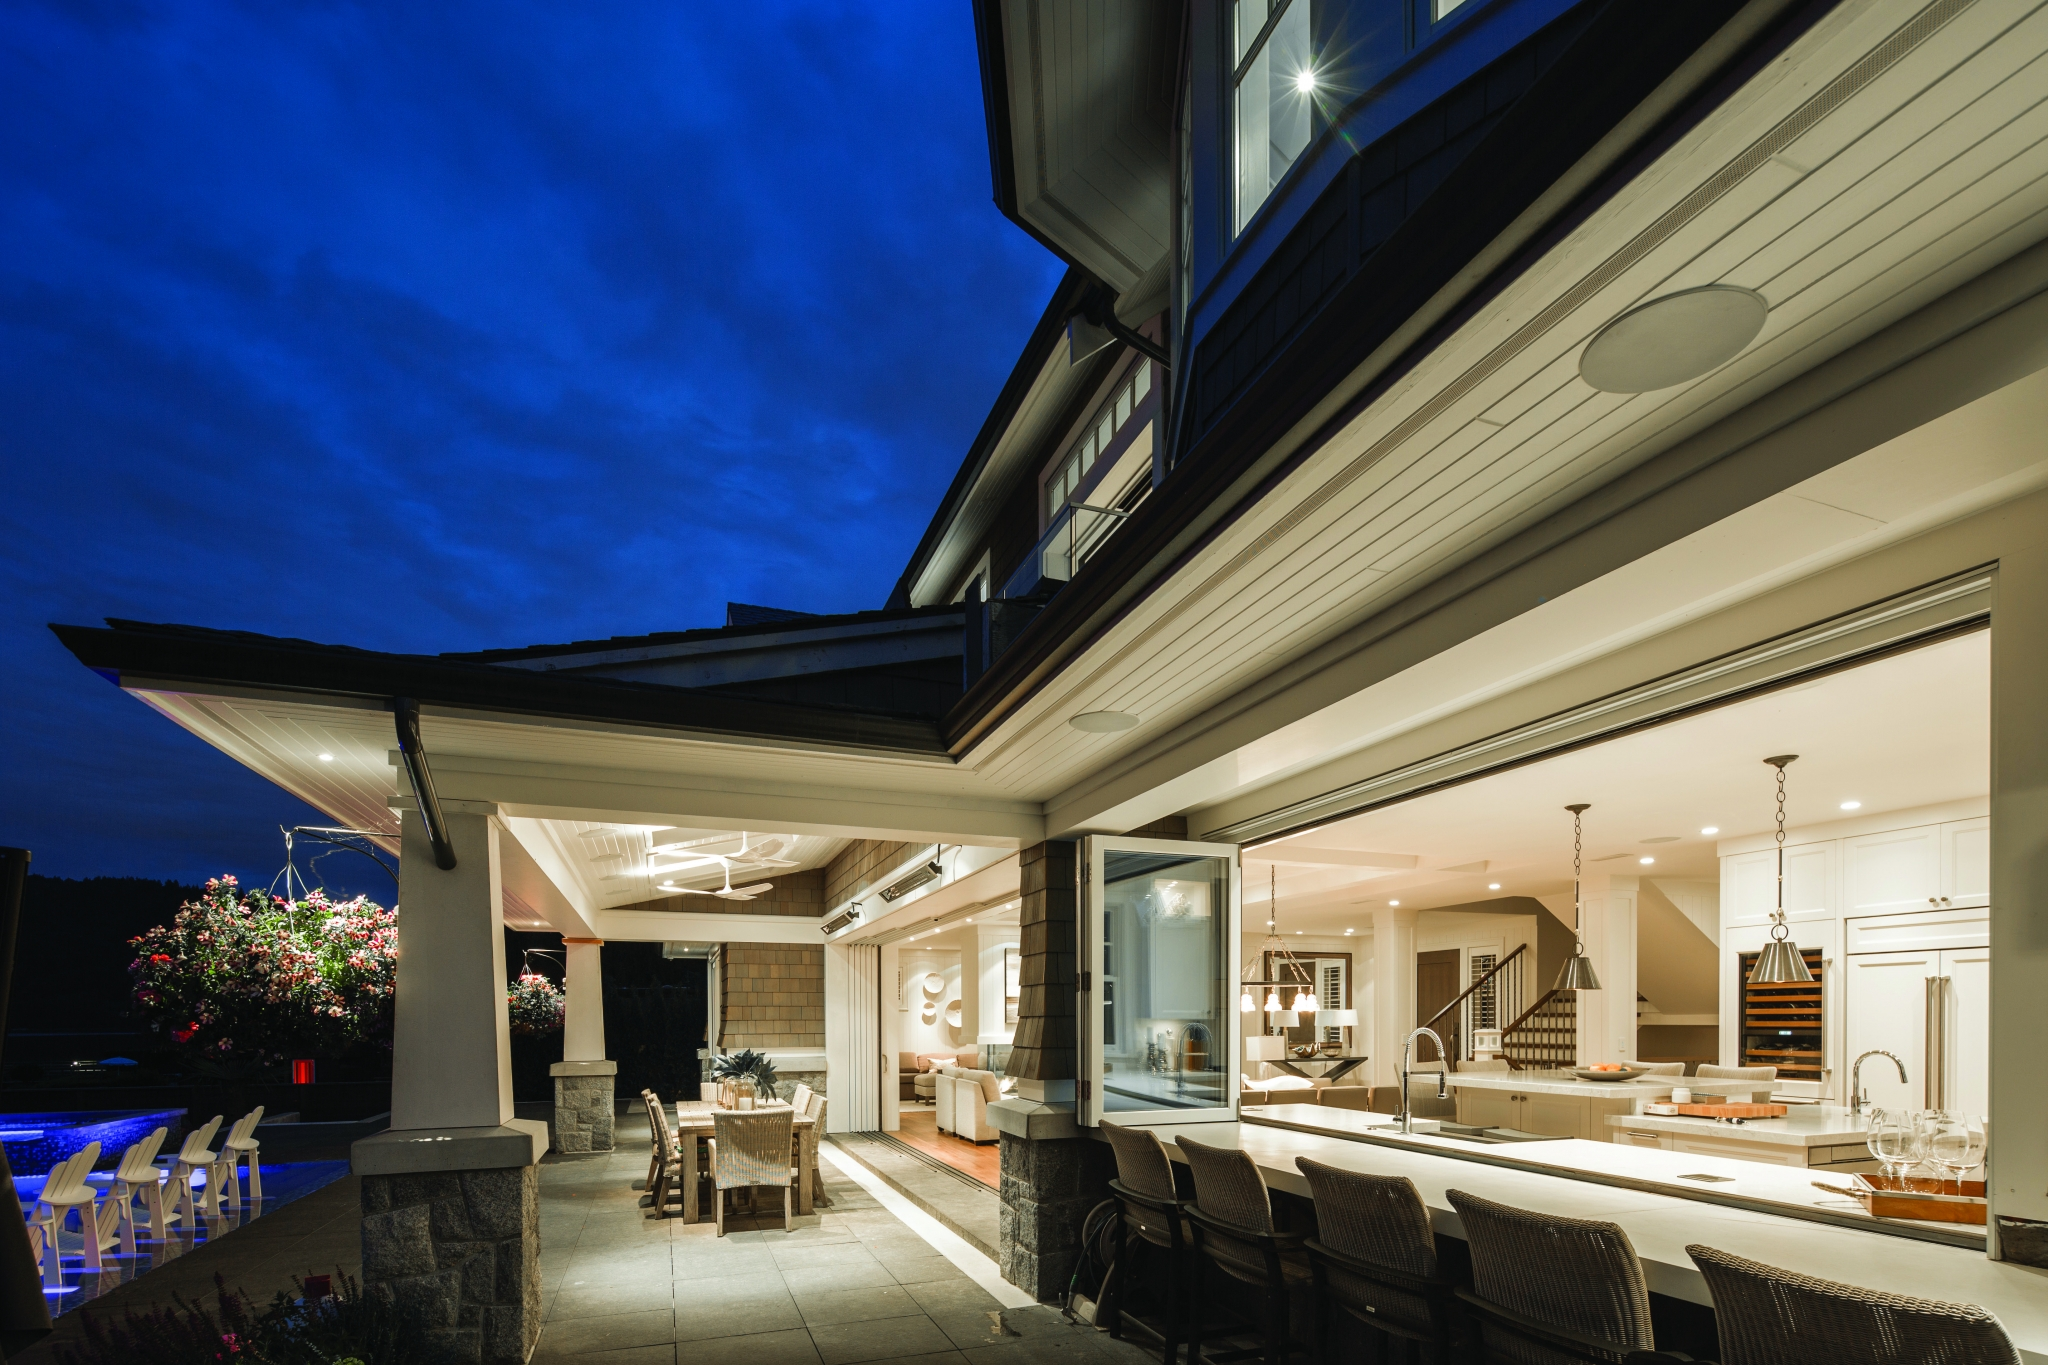 Architect: Alex Voth Builder: Westpeak Developments Interior Design: Janet Scagel City & State: Vancouver, BC Distributor: Kolbe Gallery Vancouver